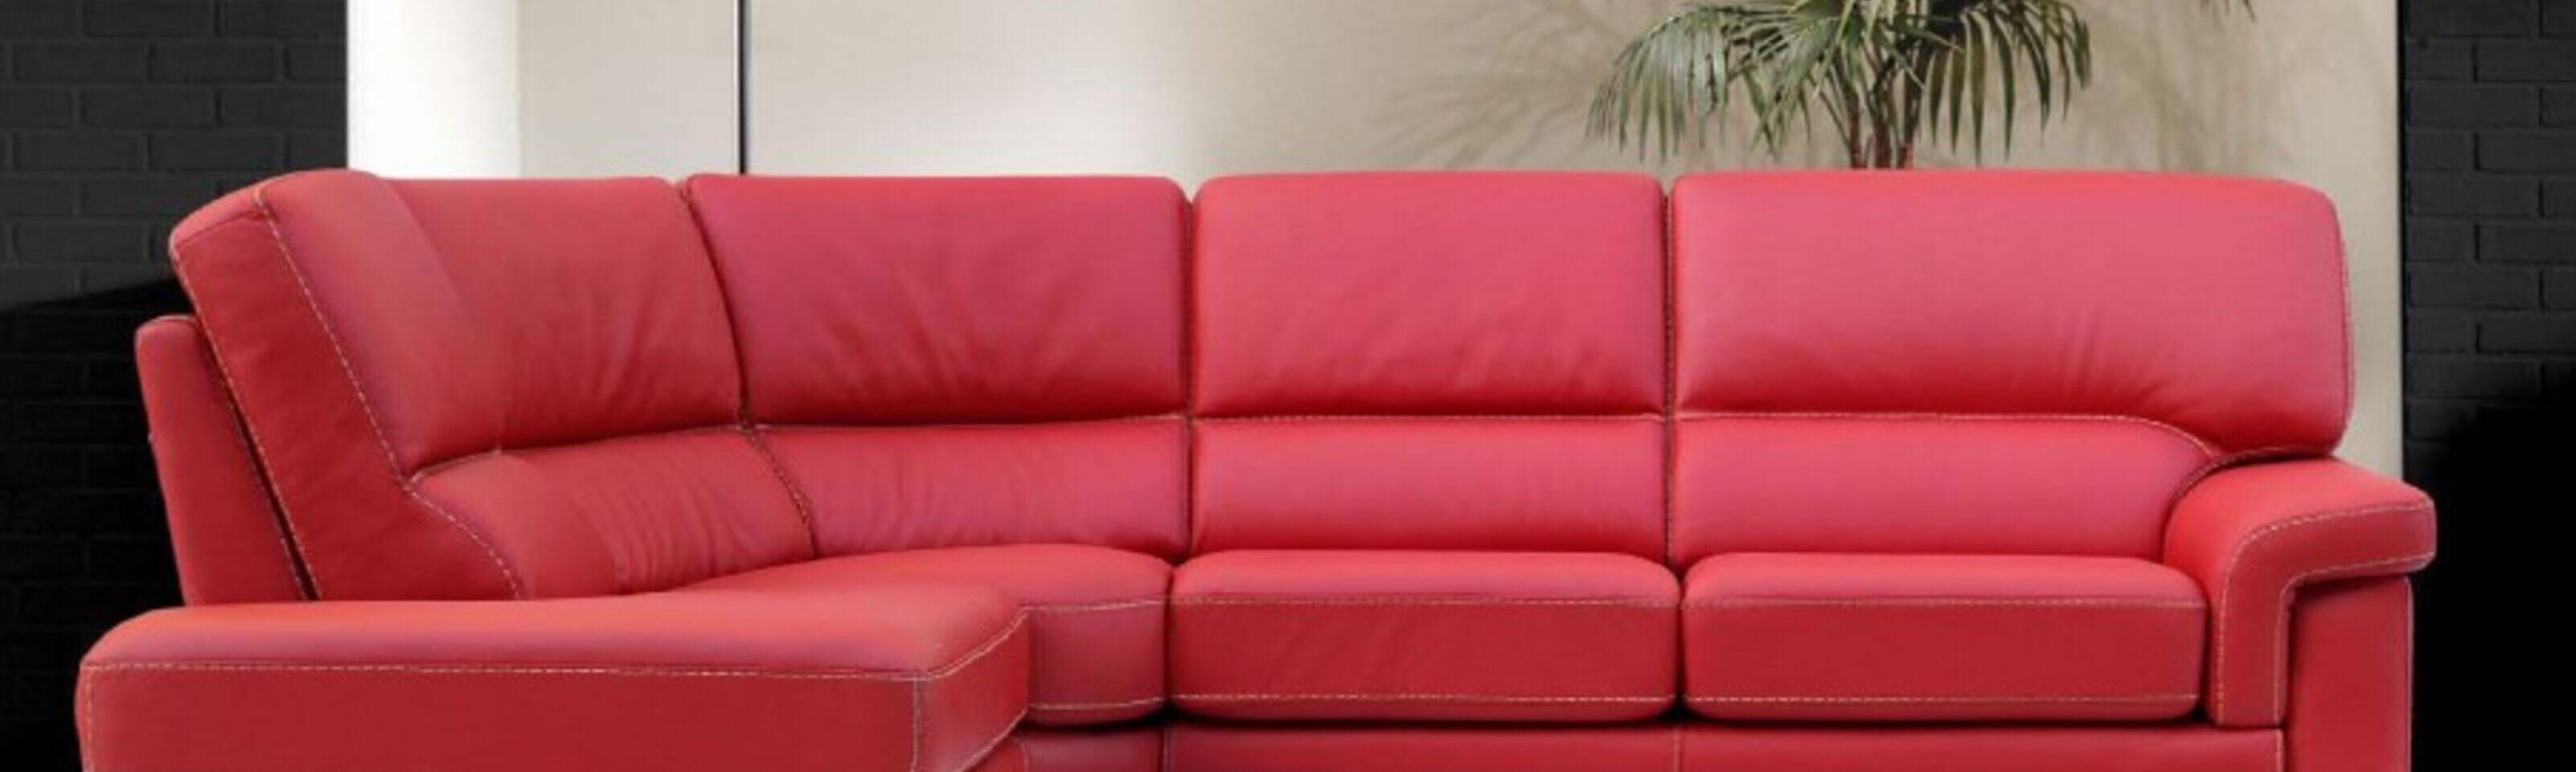 Firenze Corner Contemporary Sofa Suite Leather Sofas